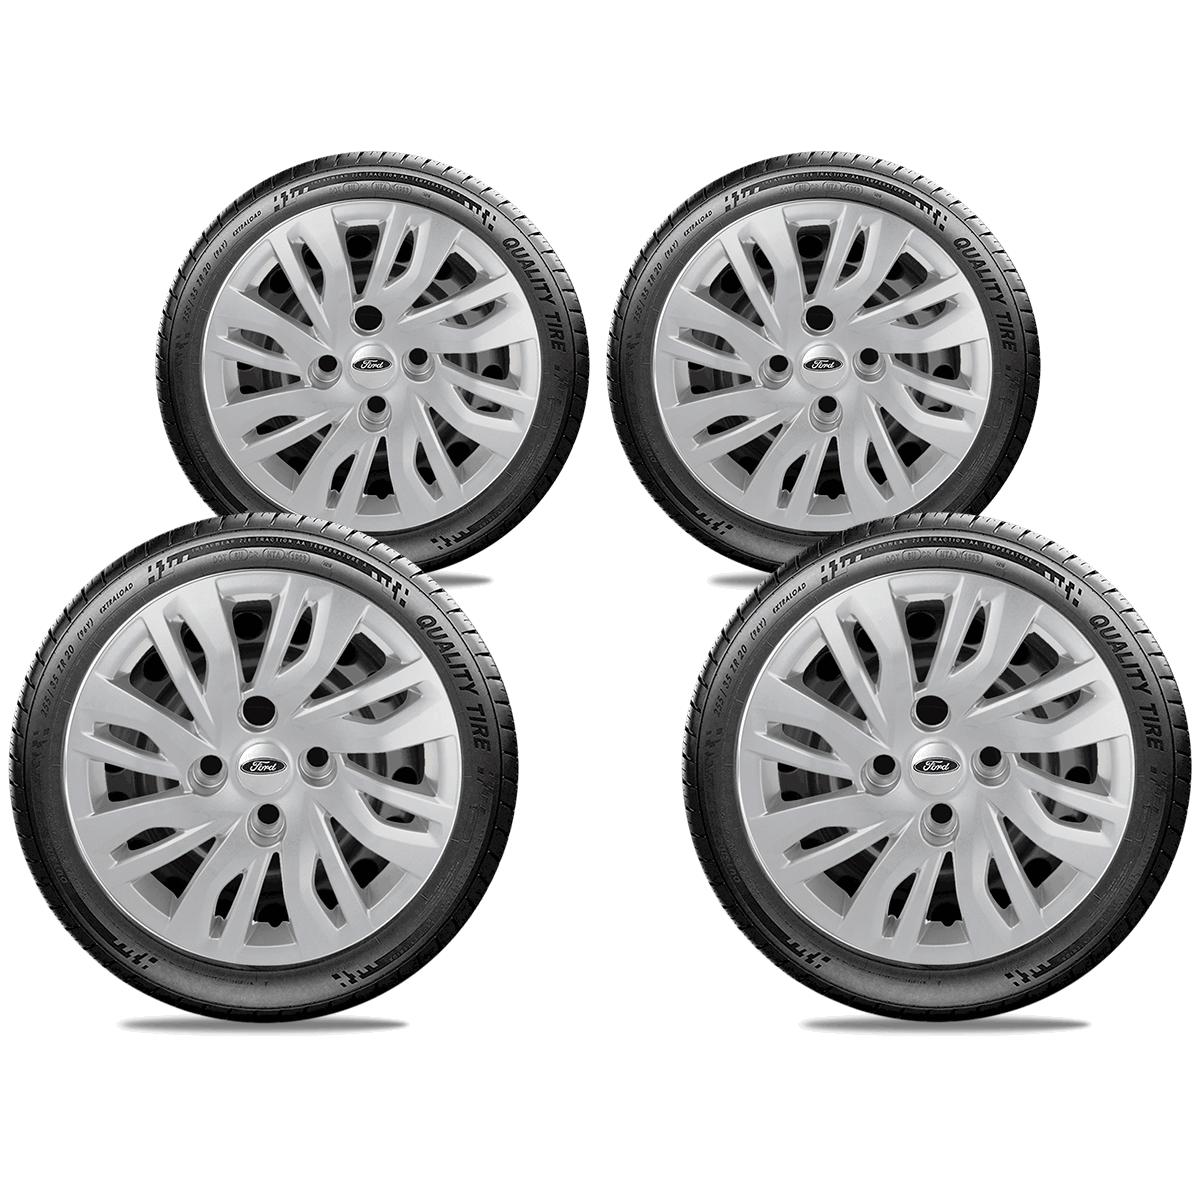 Calota Jogo 4Pçs Ford Novo Ka Fiesta 20147 2018 2019 Aro 14 G344J